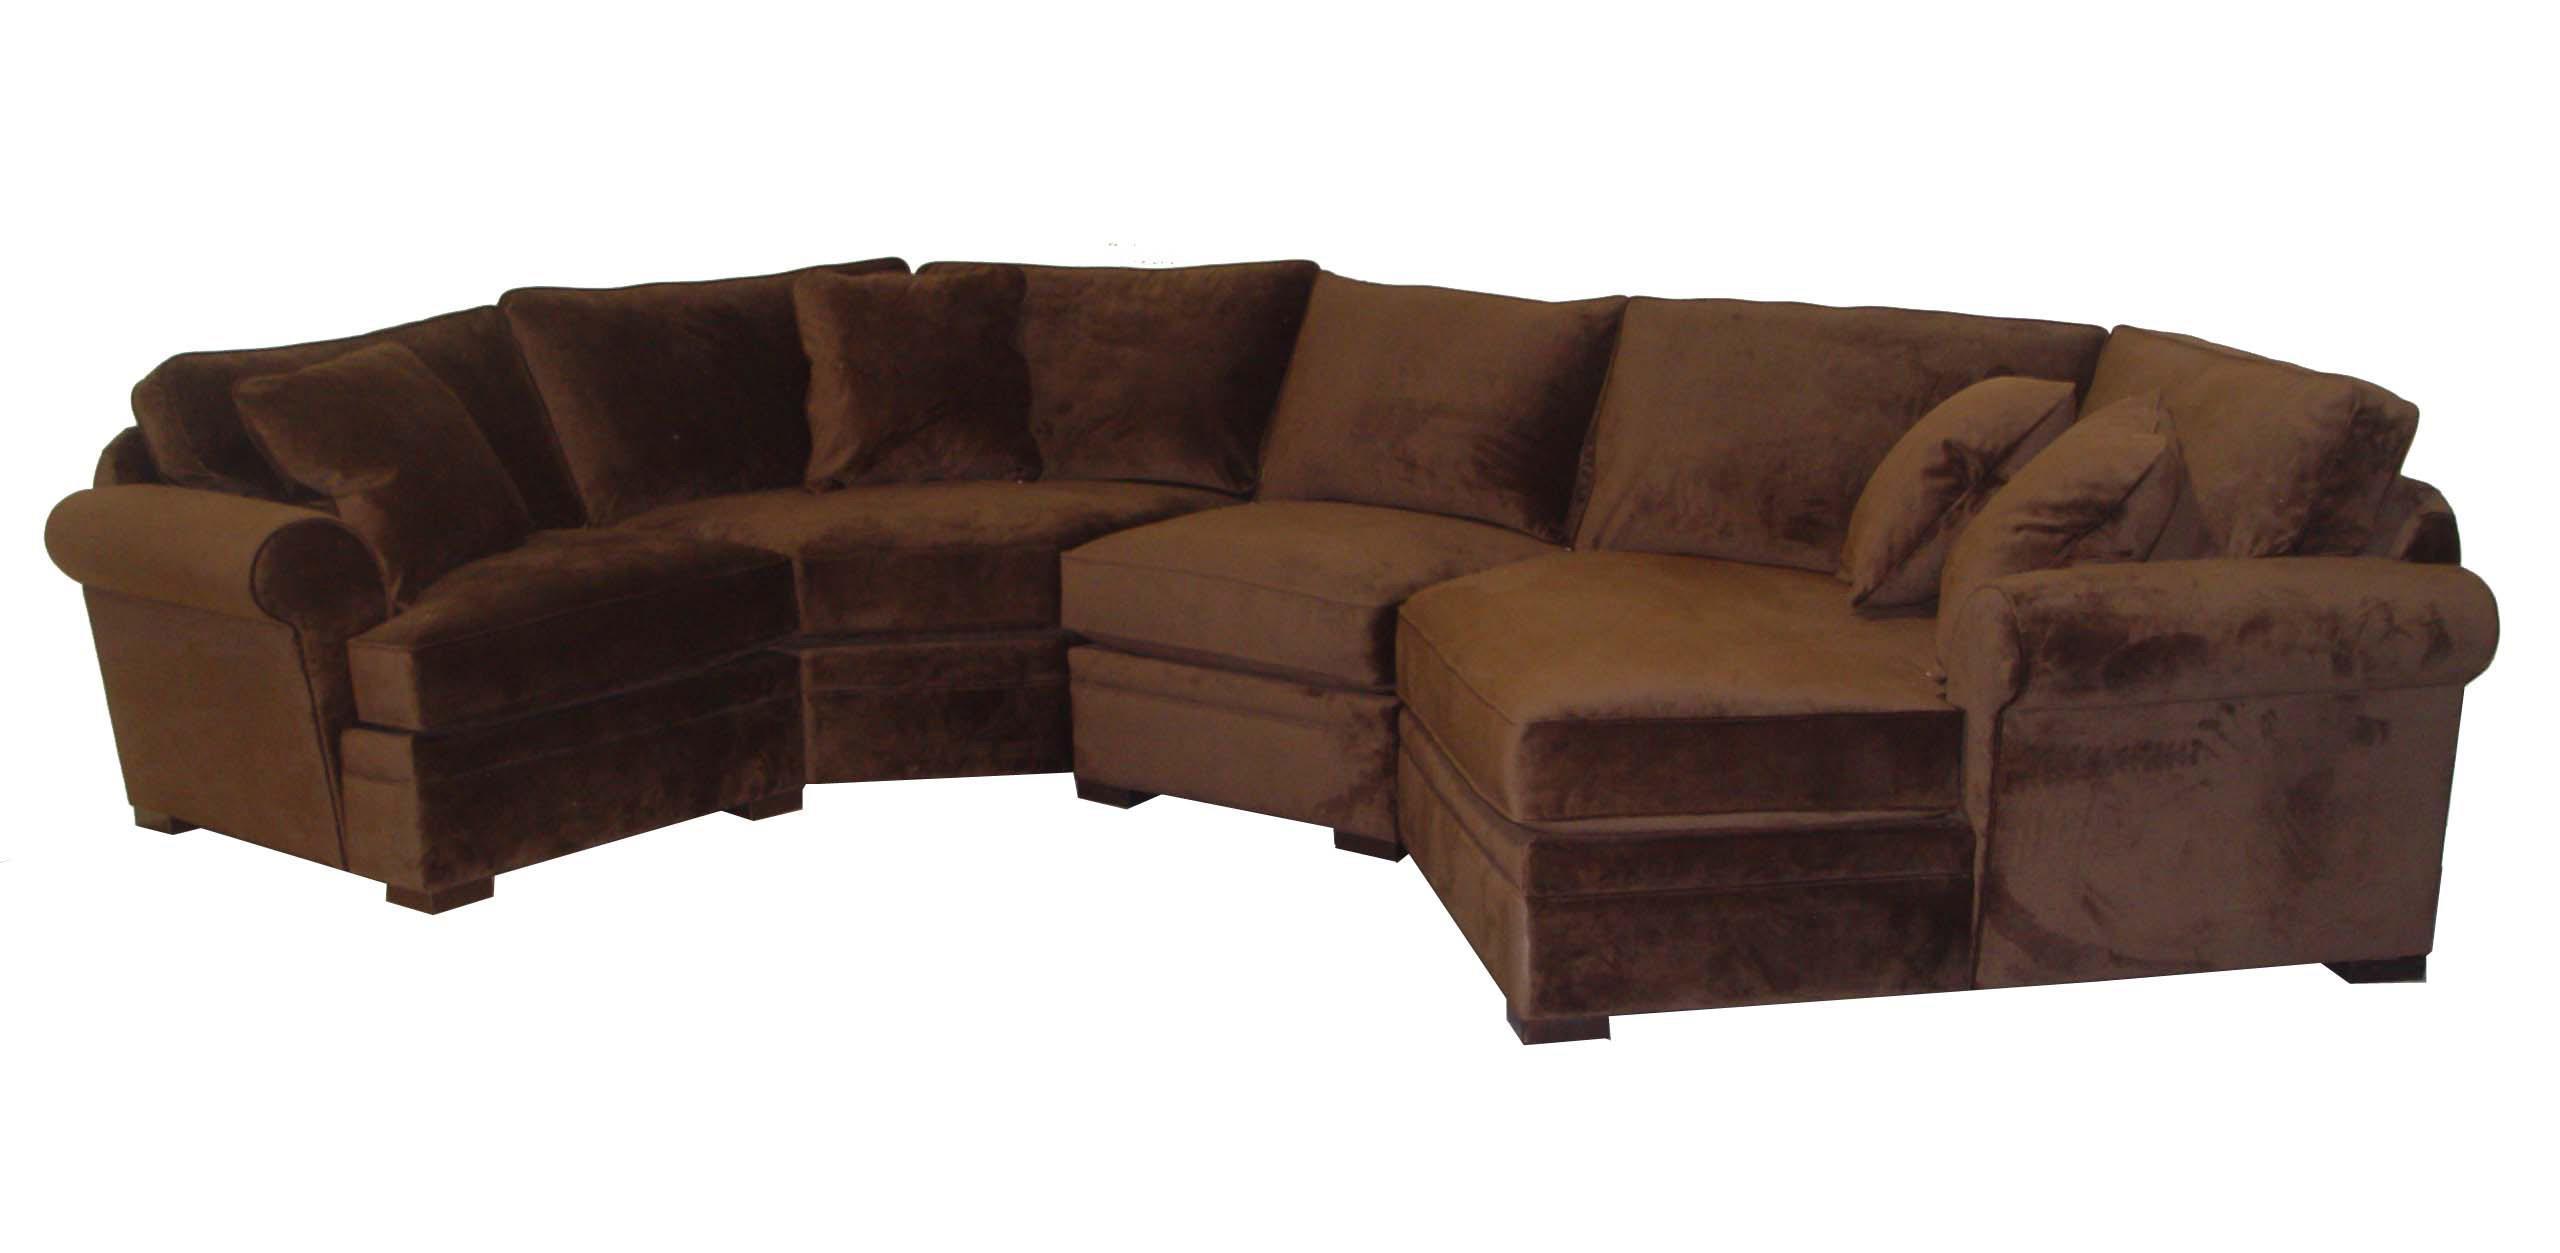 Jonathan louis hermes four piece sectional sofa with raf for 4 piece sectional sofa with chaise